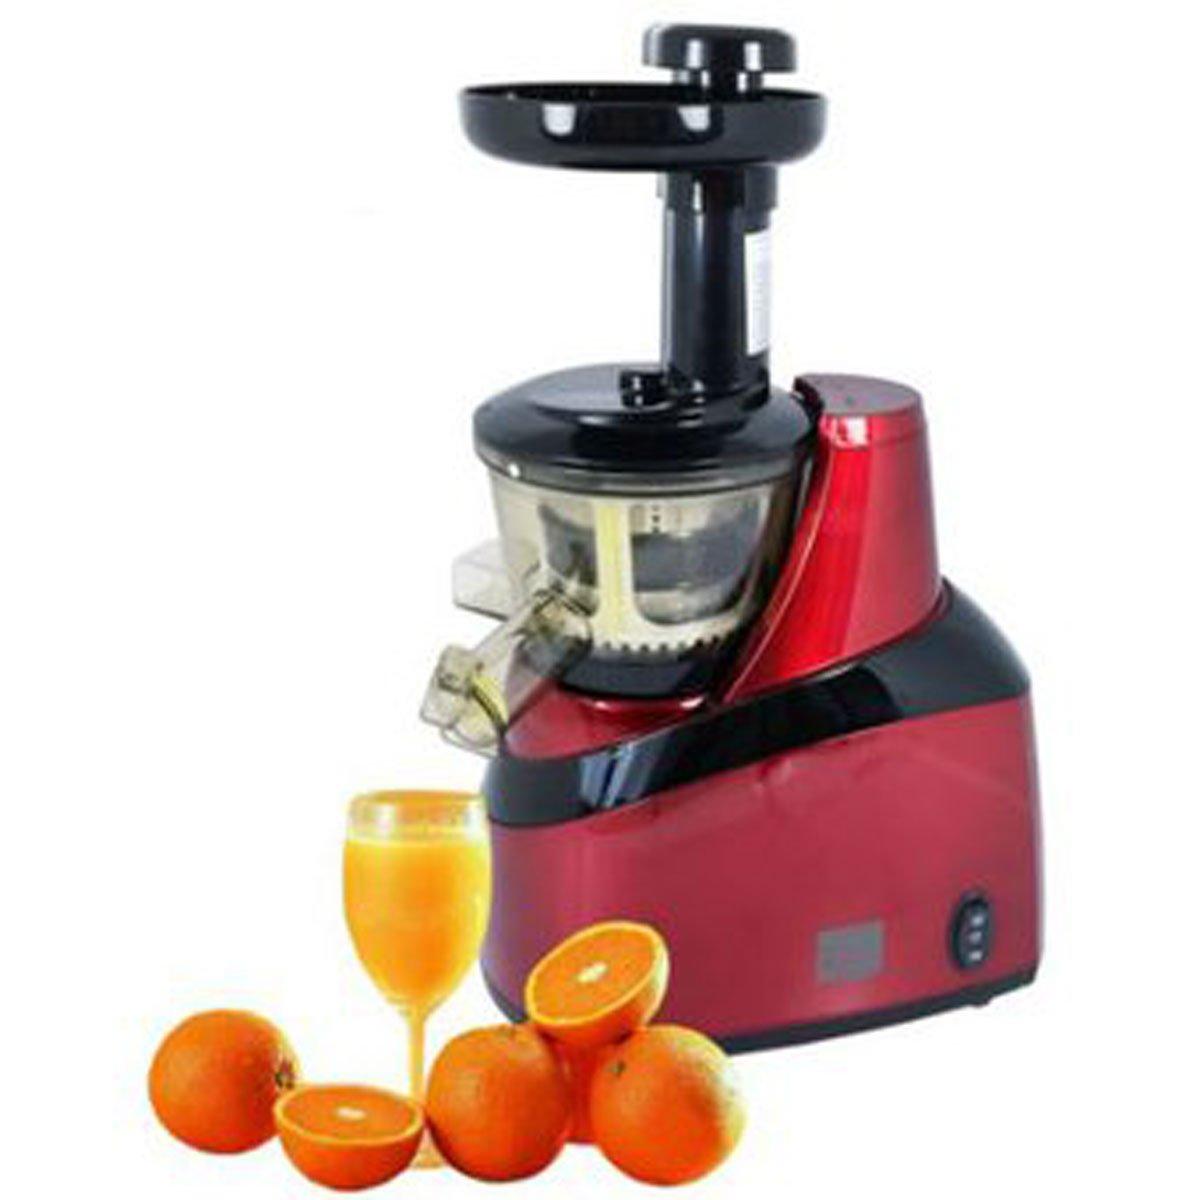 Testimoni Slow Juicer Relance : Extractor de alimentos del sistema lento Relance SEARS.COM.MX - Me entiende!